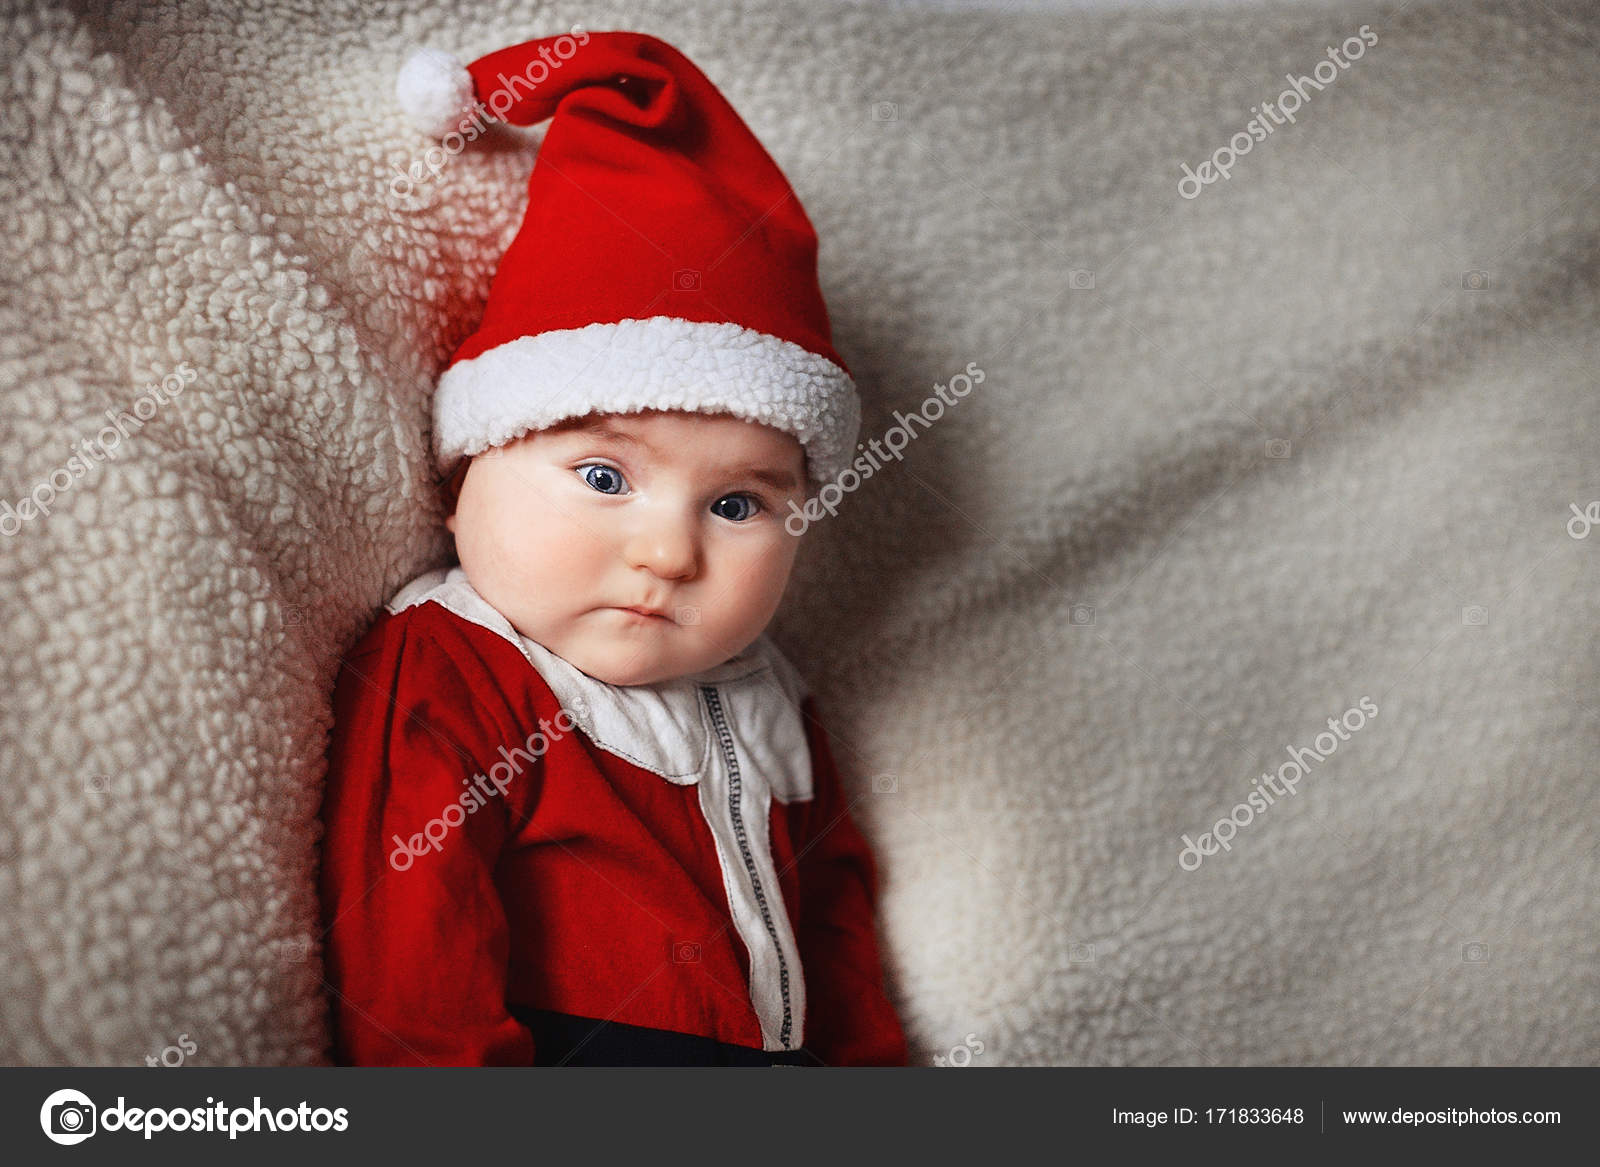 1f31f287456 Μωράκι σε κόκκινο σκουφάκι του Αϊ-Βασίλη γιορτάζει τα Χριστούγεννα ...